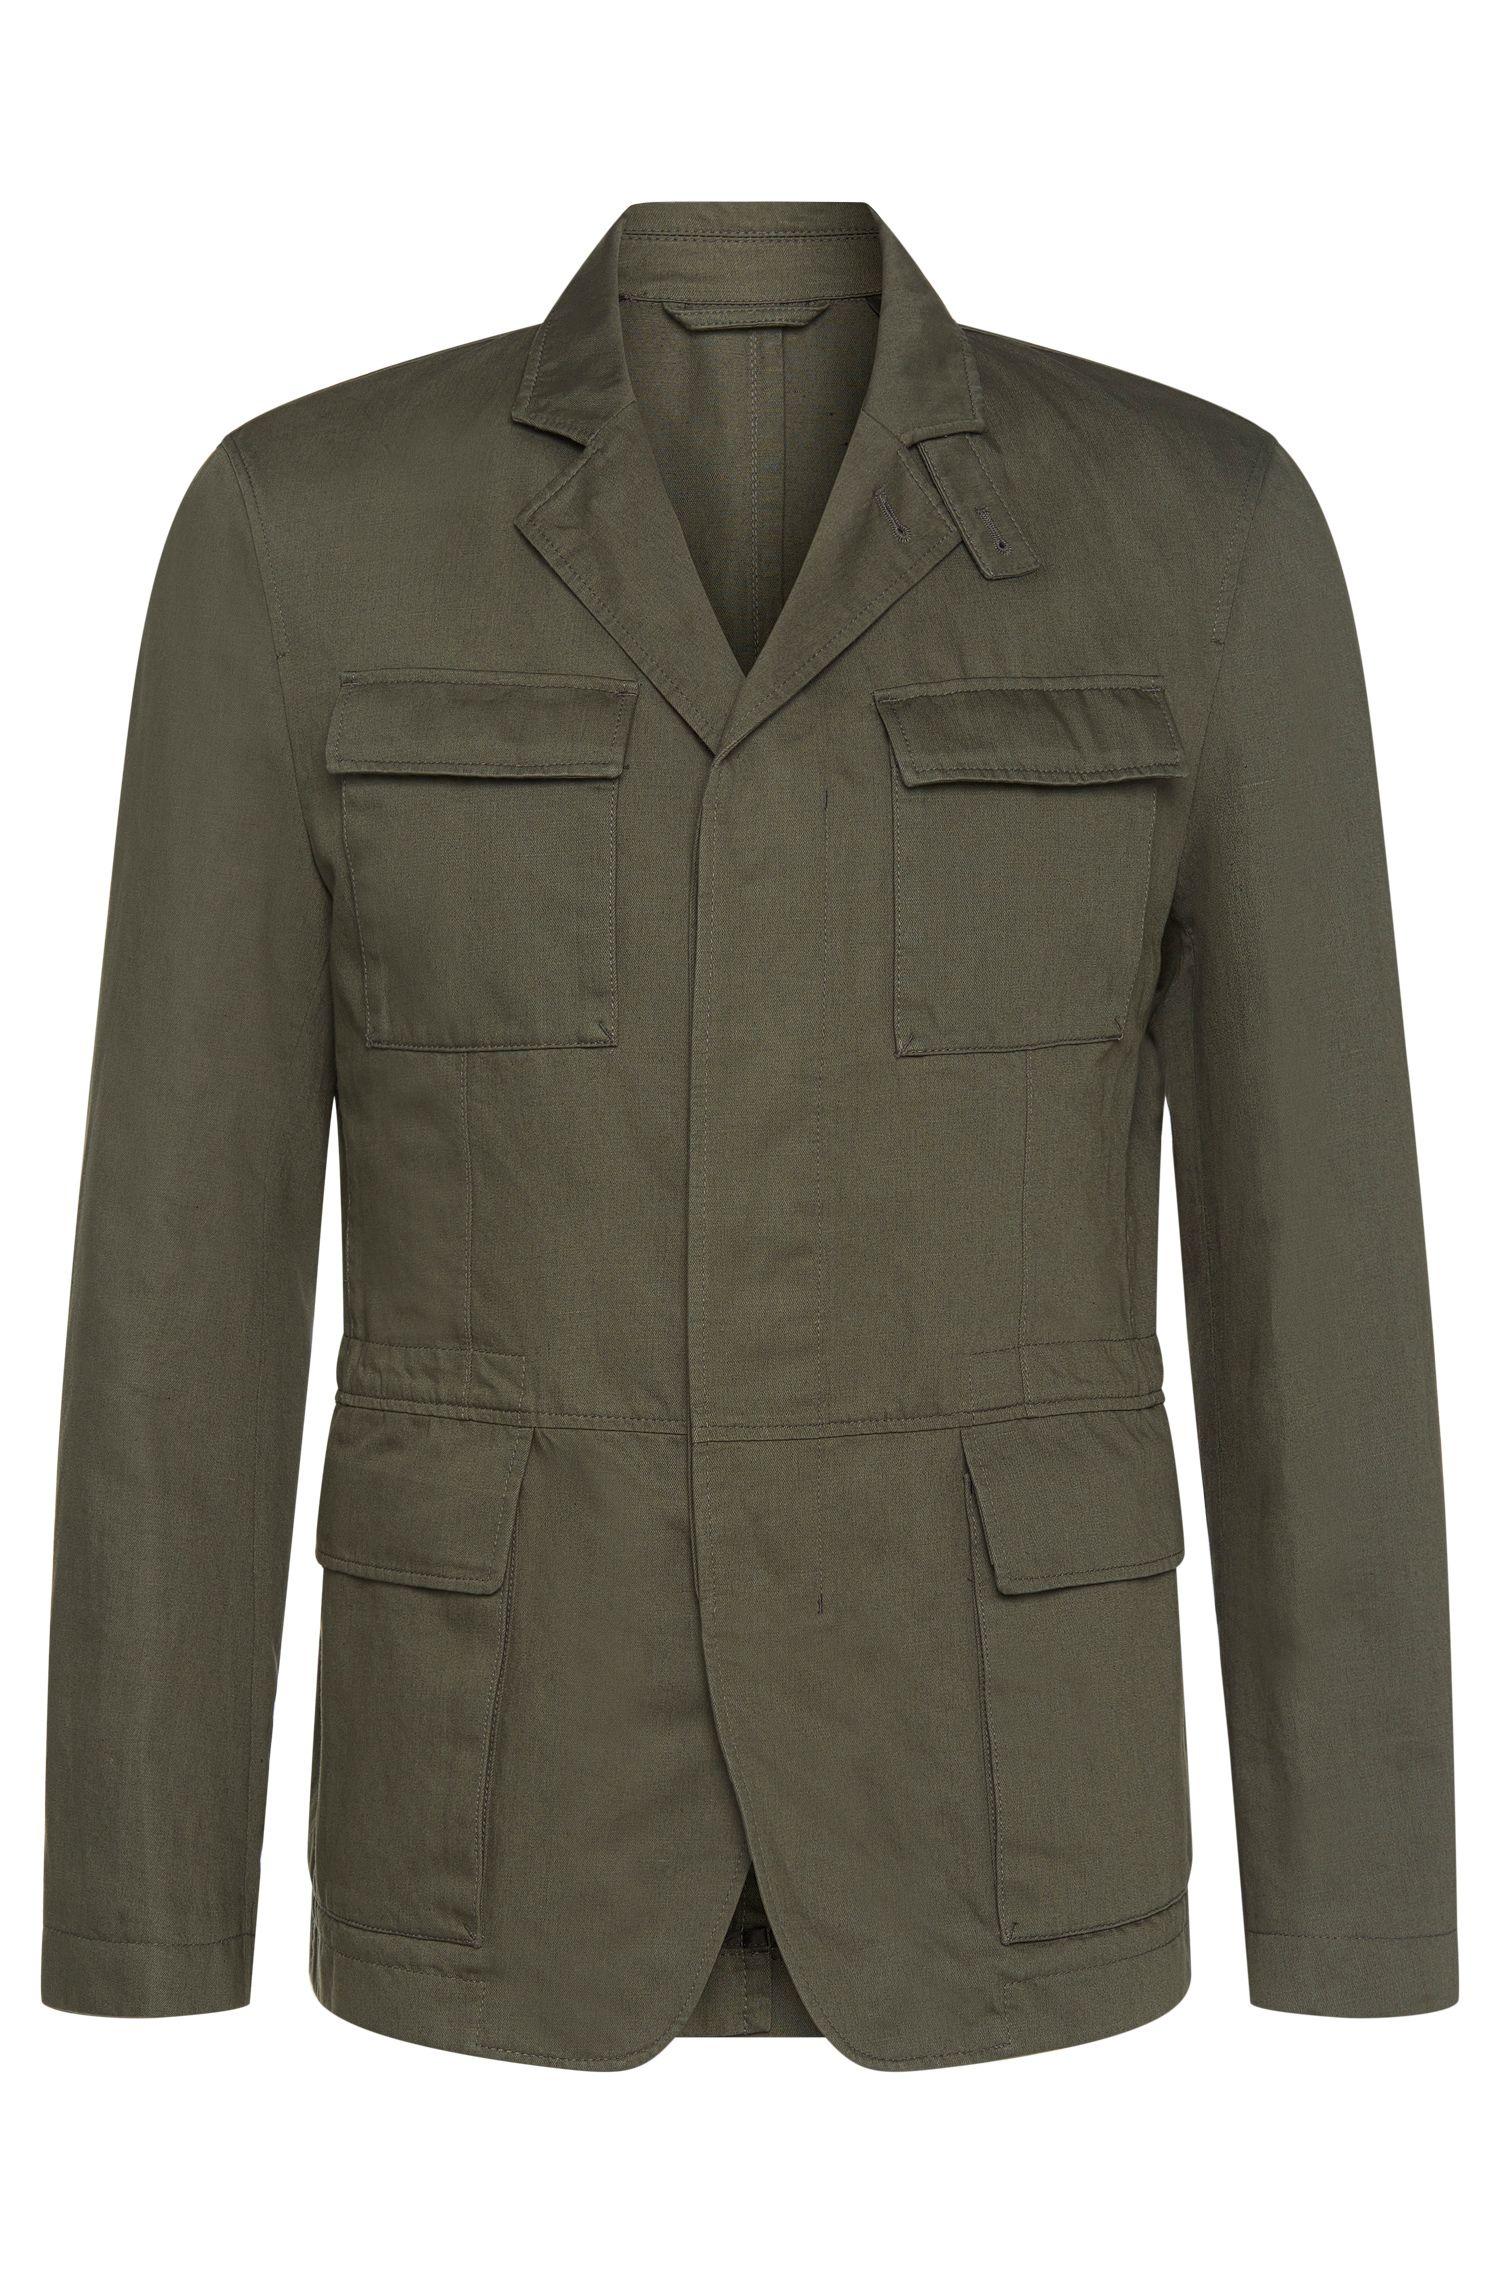 Cotton Linen Field Jacket | Nelio W